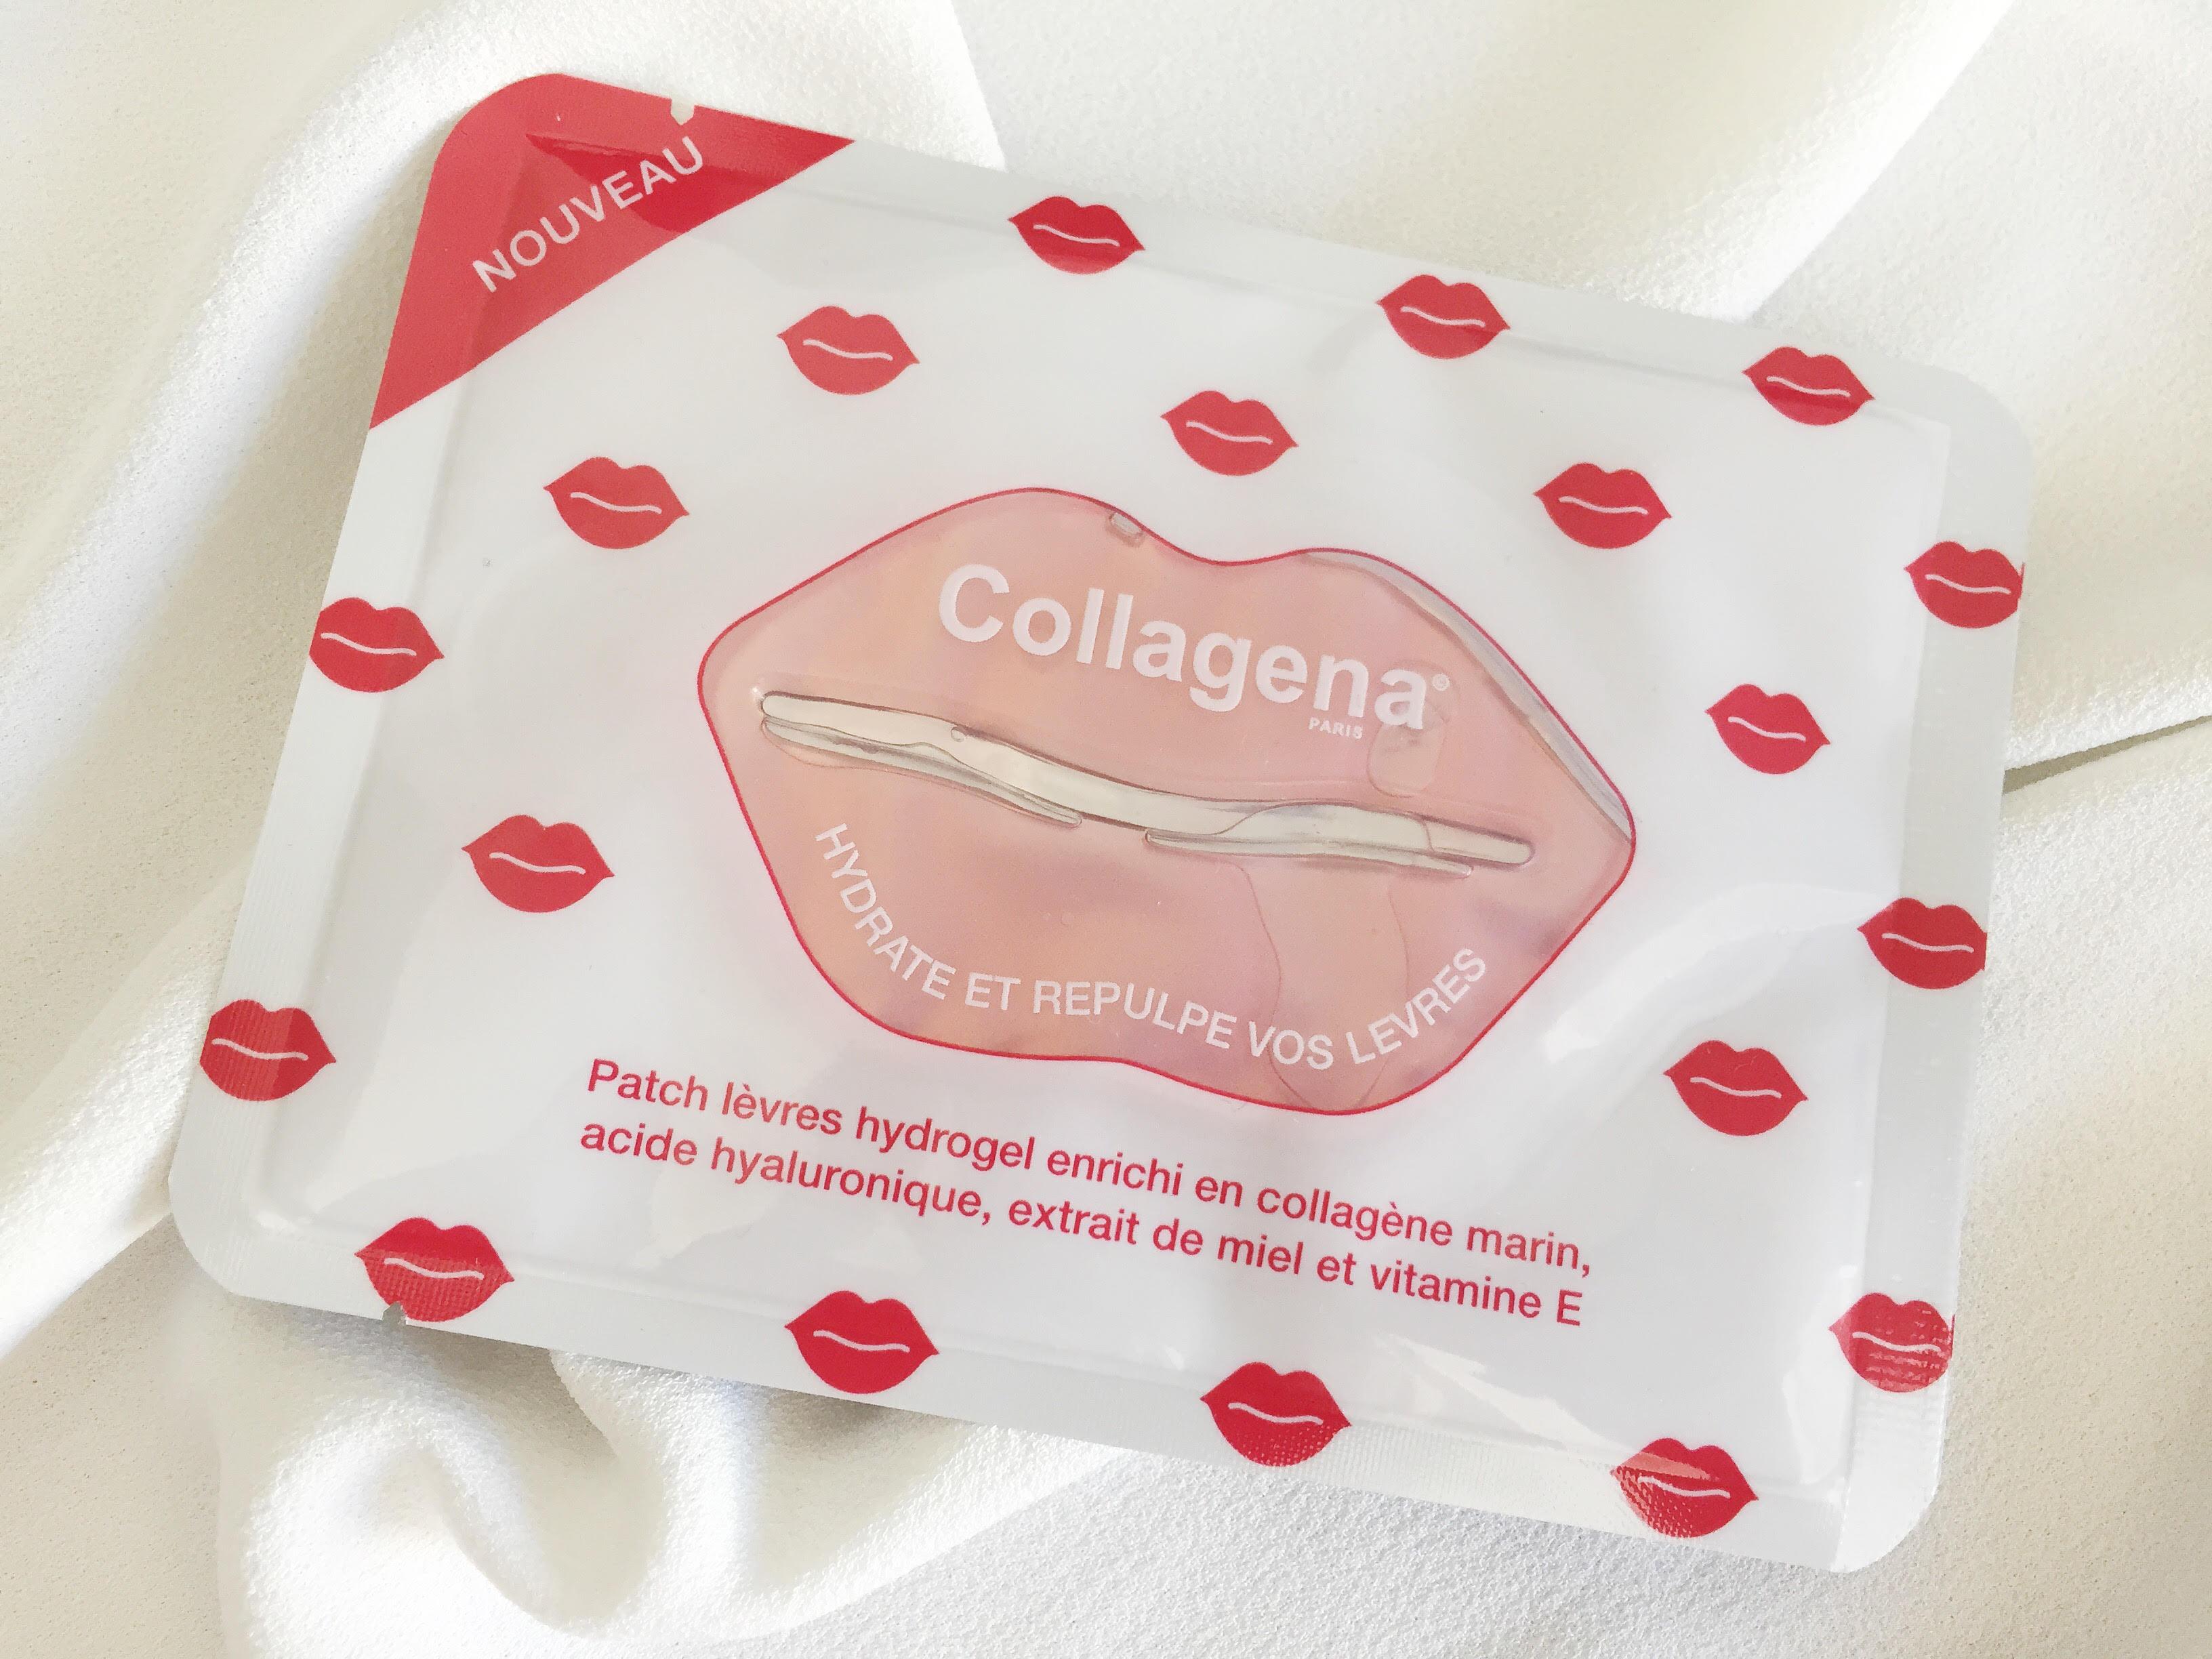 Collagena - 1